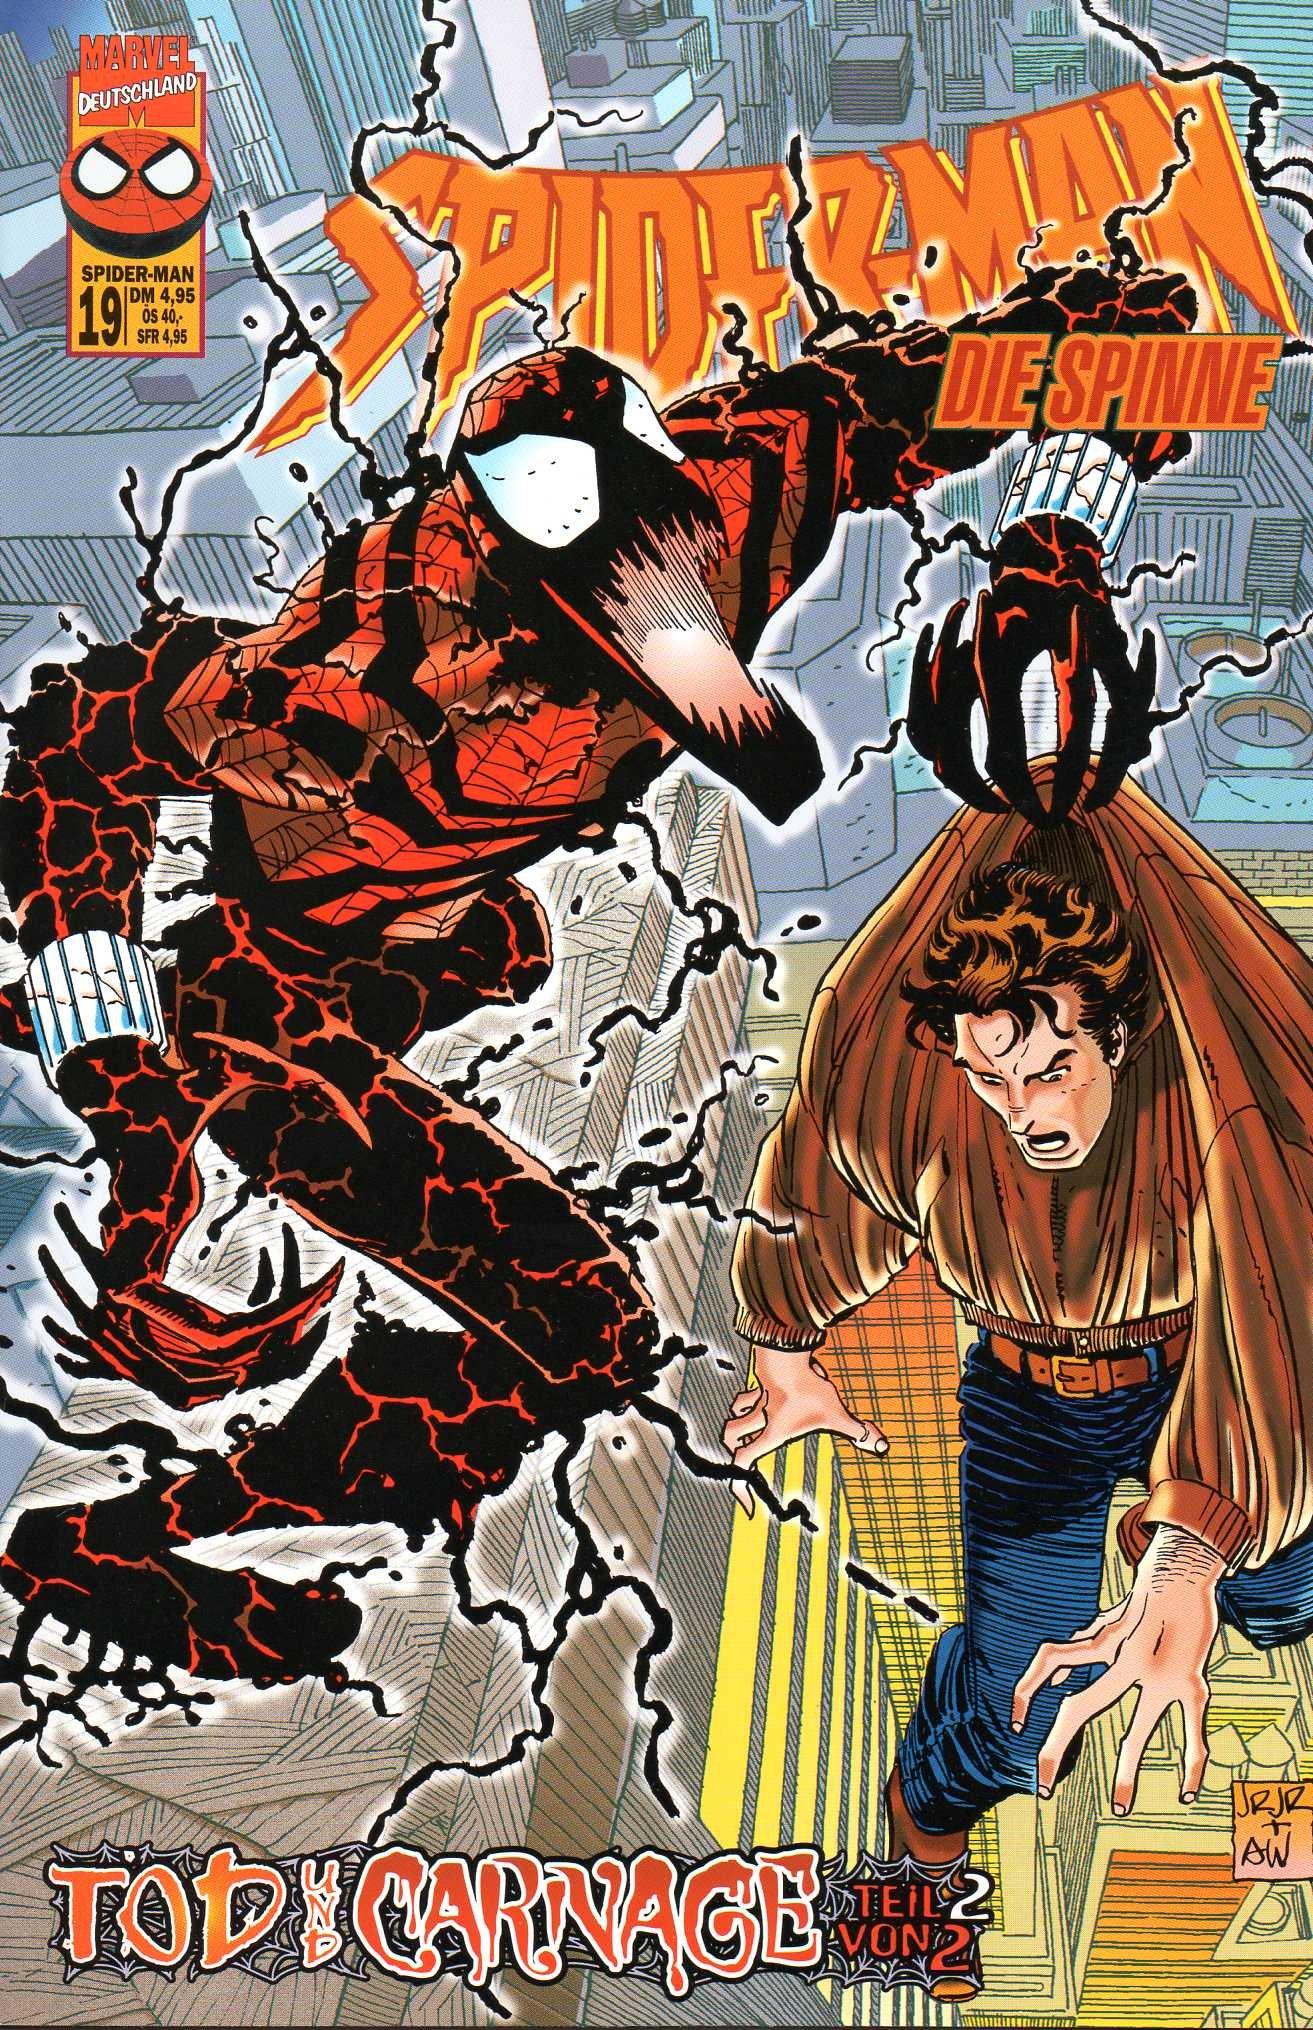 *Verlagsvergriffen* DISNEY MARVEL Comic SPIDER-MAN # 19: Böses im Blut! (Die Spinne) Comic – 1998 Panini B00NRRM6MS Belletristik - Comic Cartoon